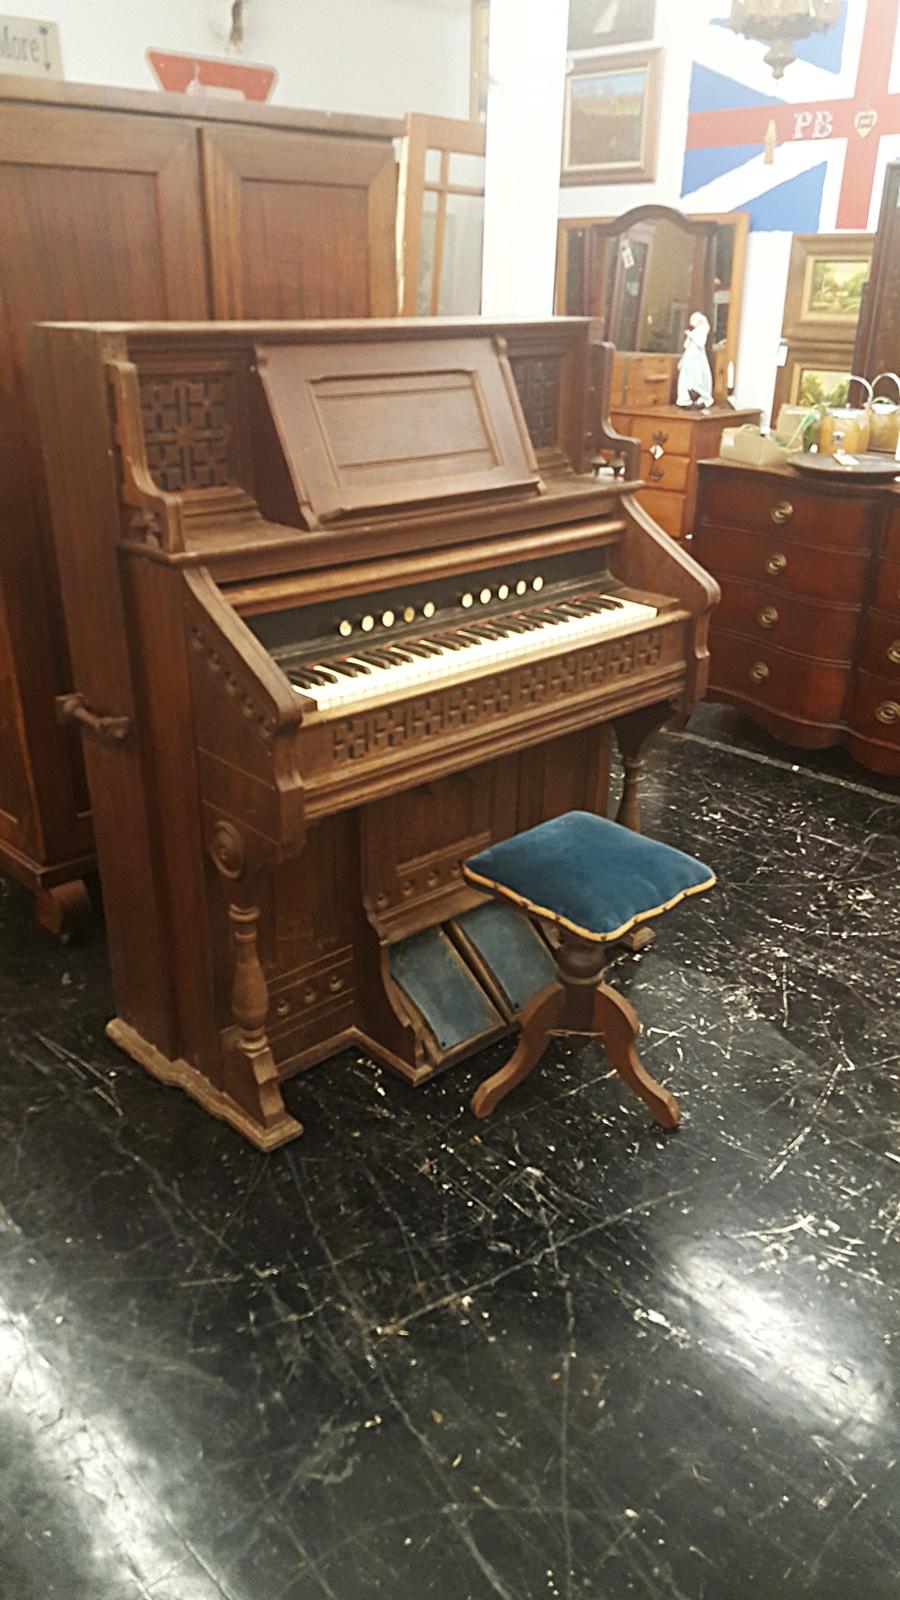 Swinger 600 kimball organ user manual